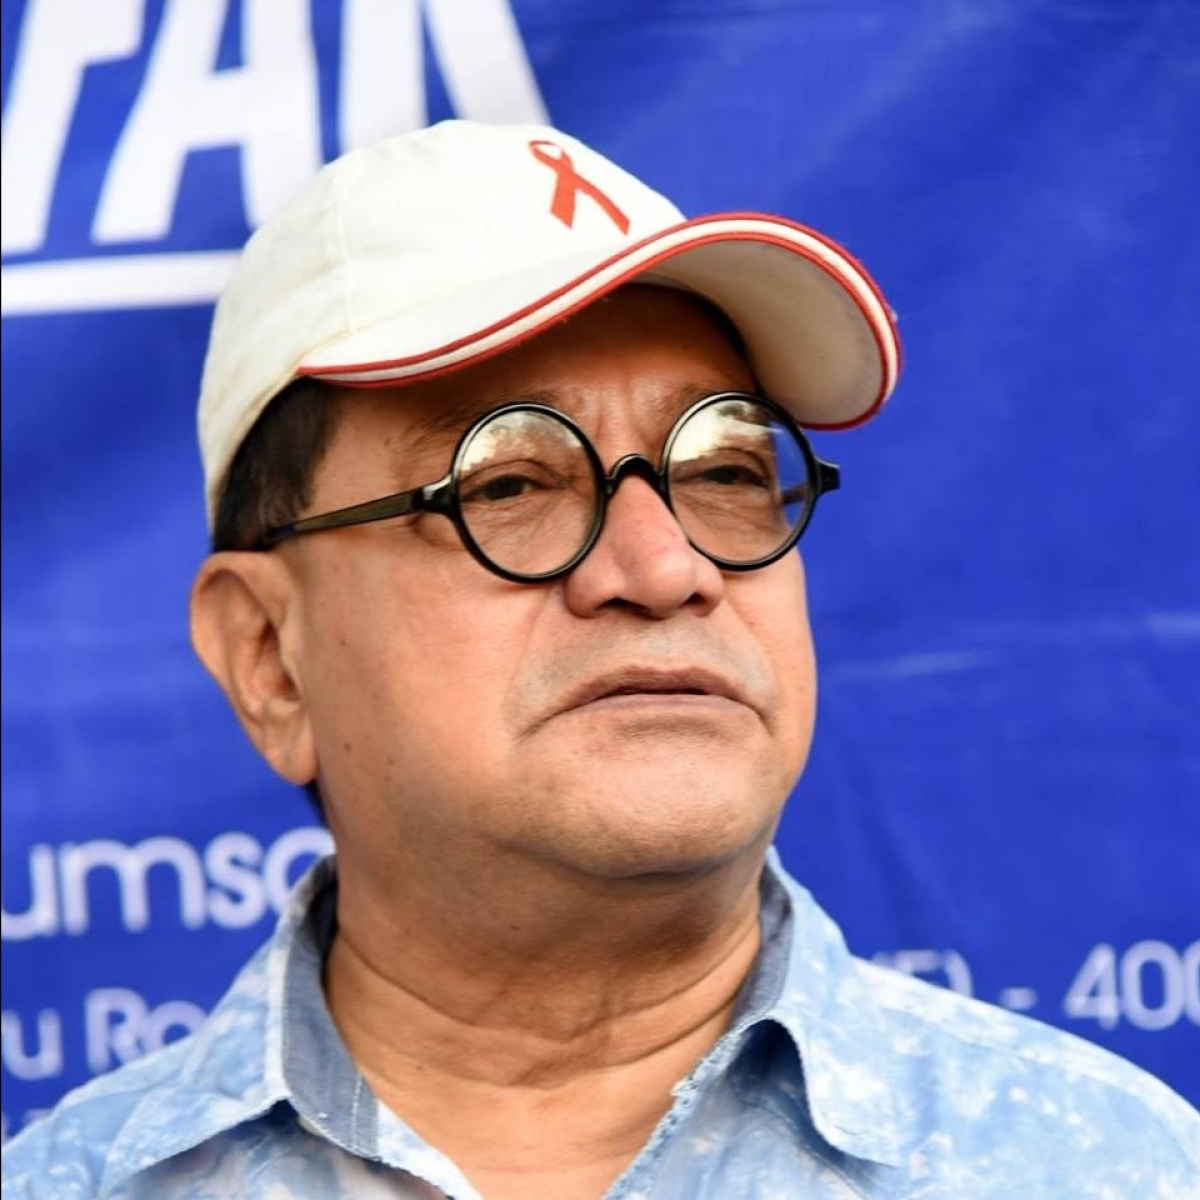 Section 377 crusader Ashok Row Kavi steps down as Humsafar Trust Chairman